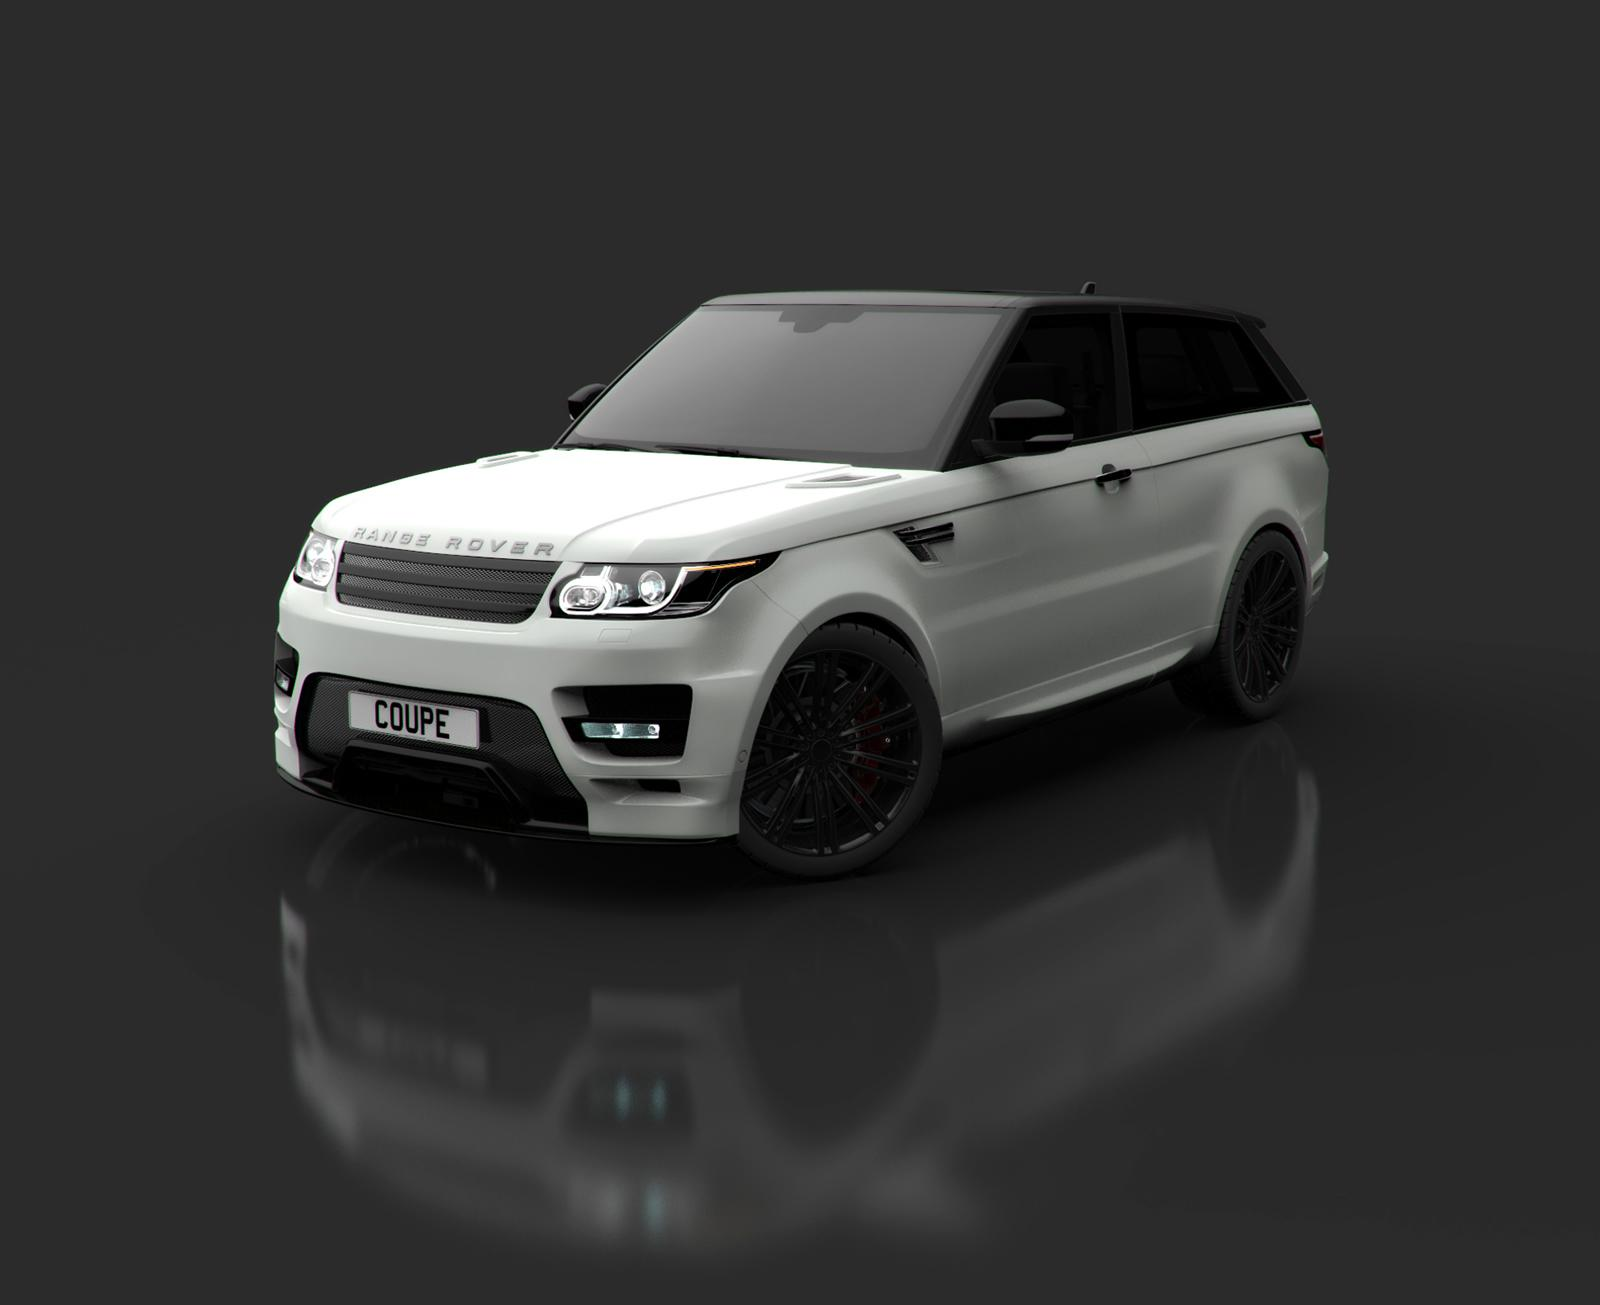 Bulgari Design Land Rover Range Rover Coupe custom two door SUV